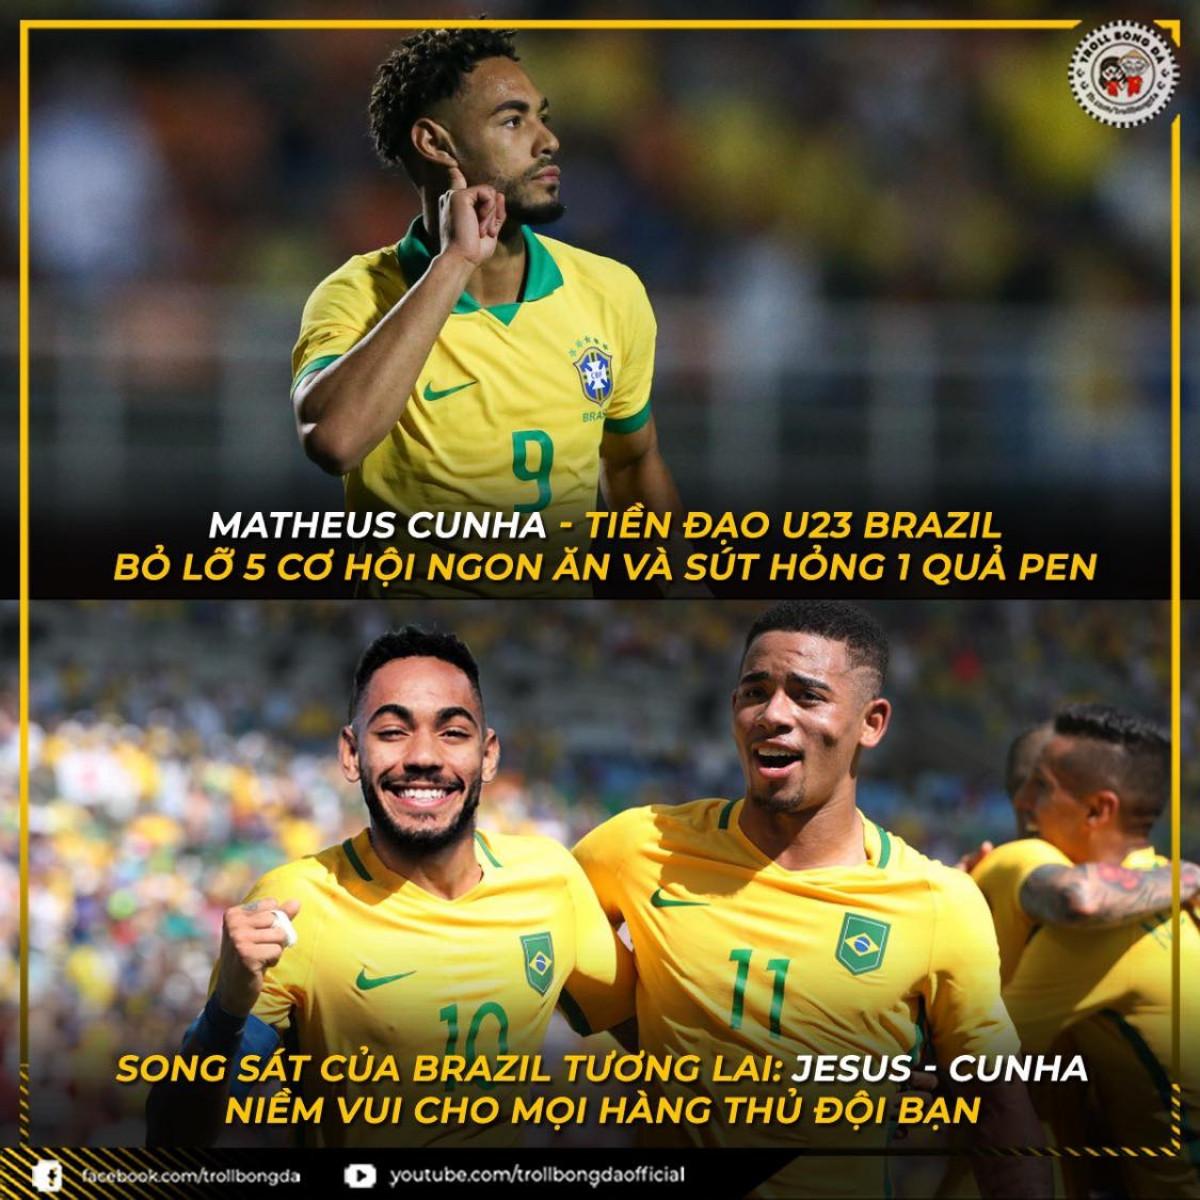 Matheus Cunha - tiền đạo